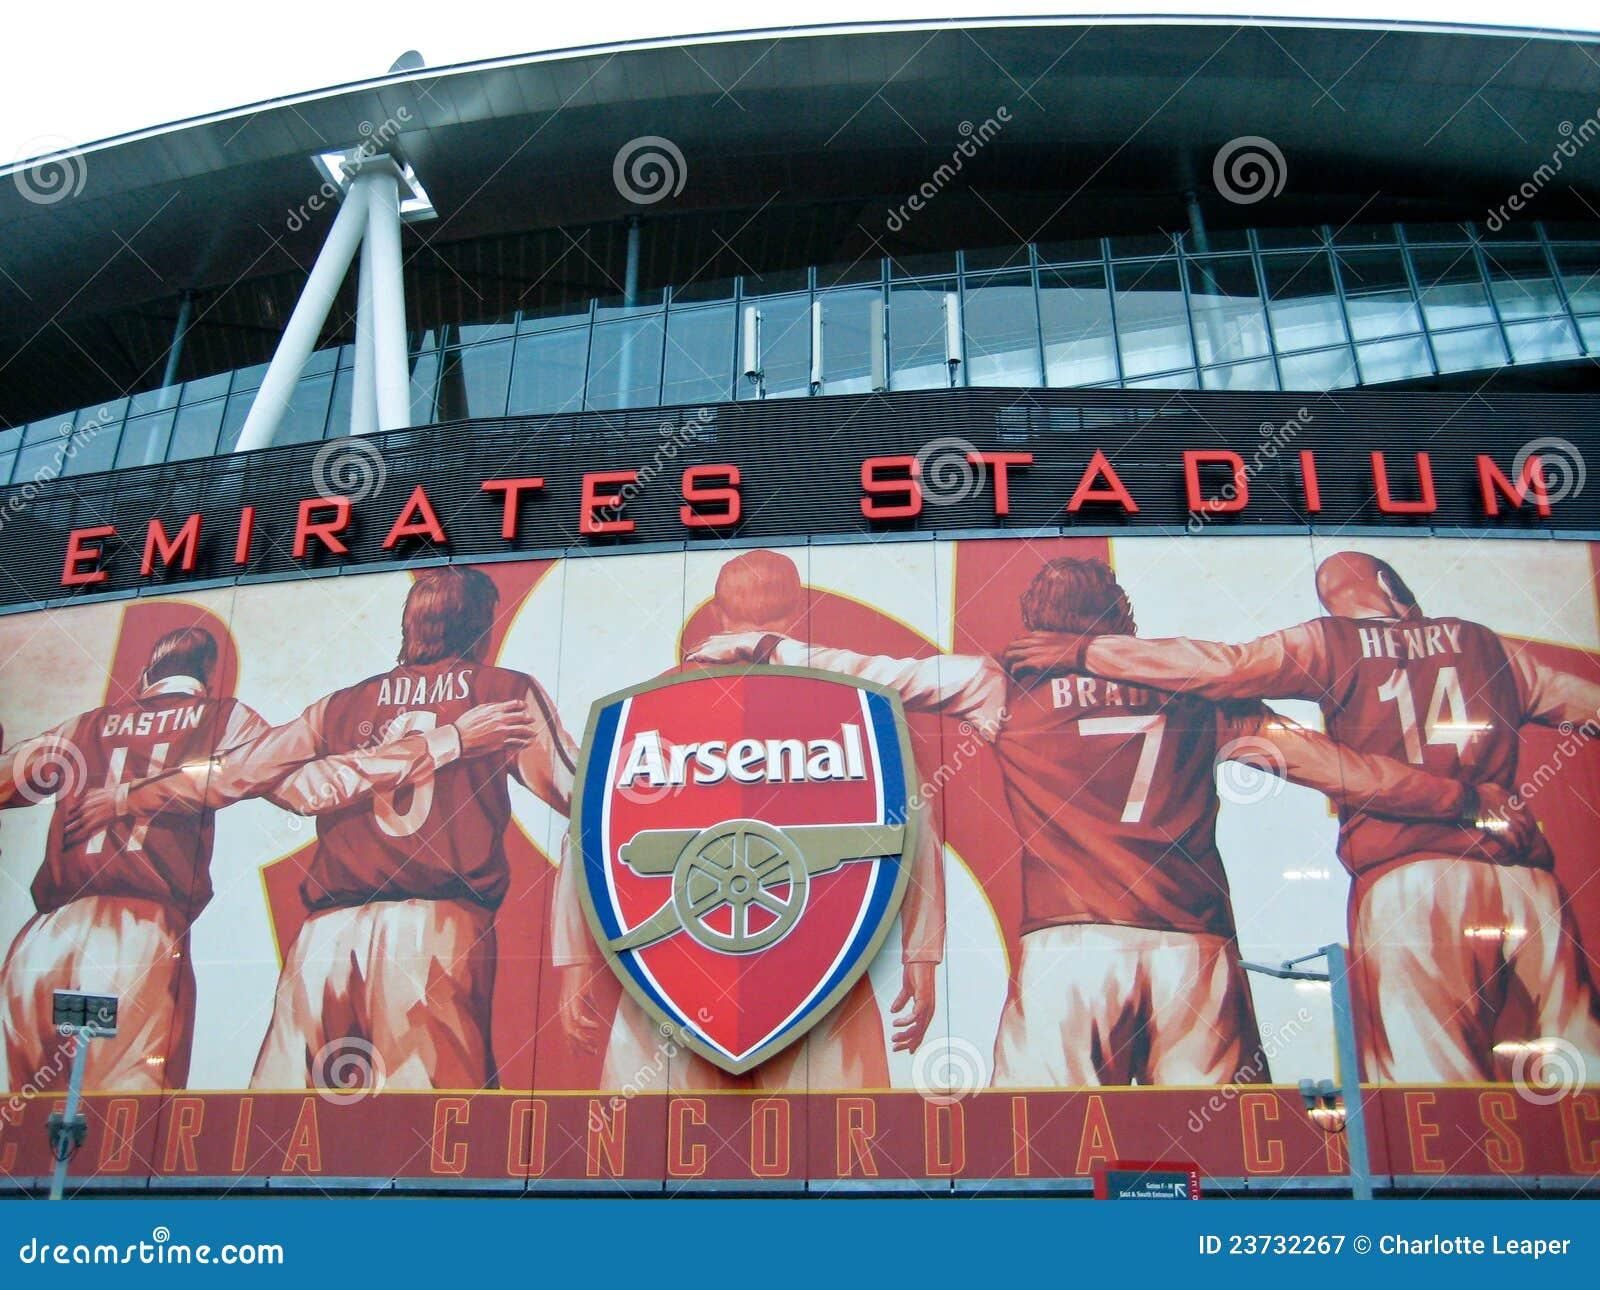 Arsenal Football Legen...